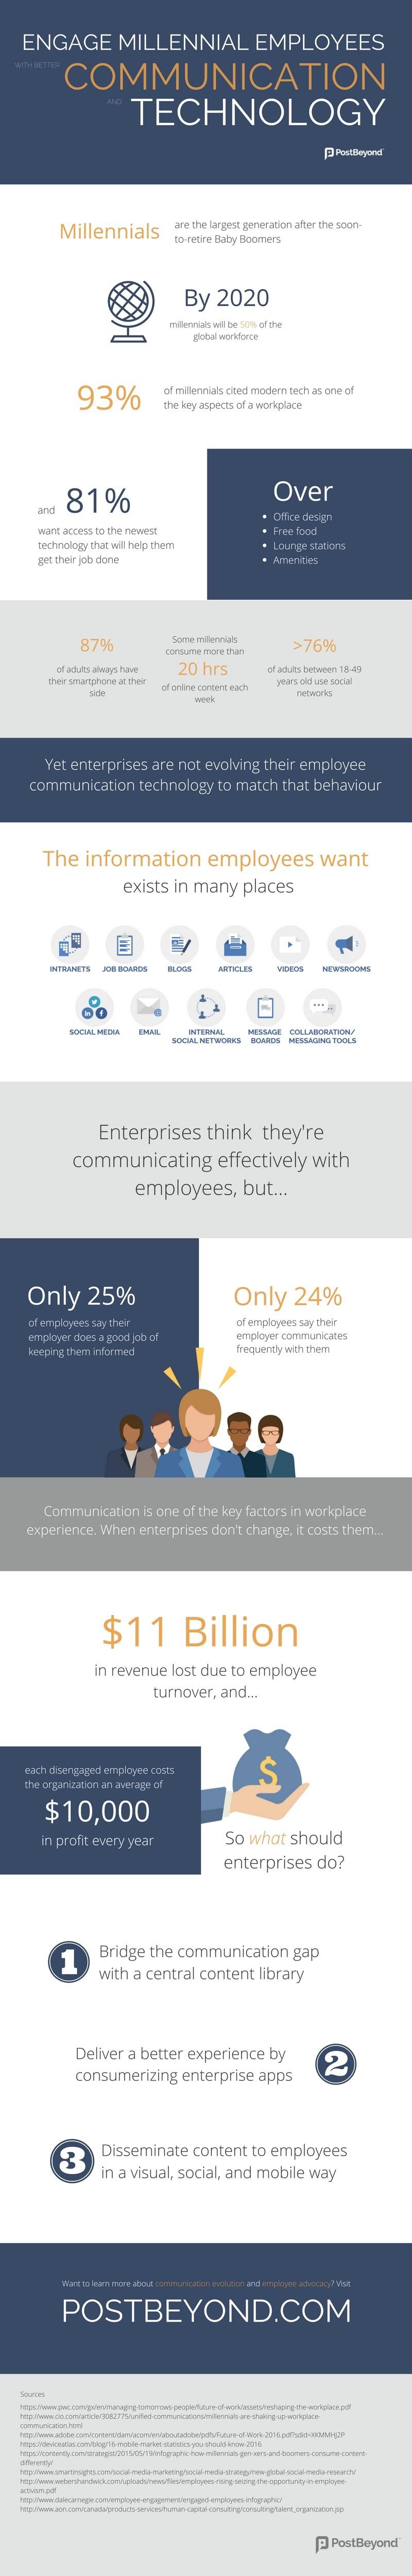 Engage Millennial Employees Communication Technology